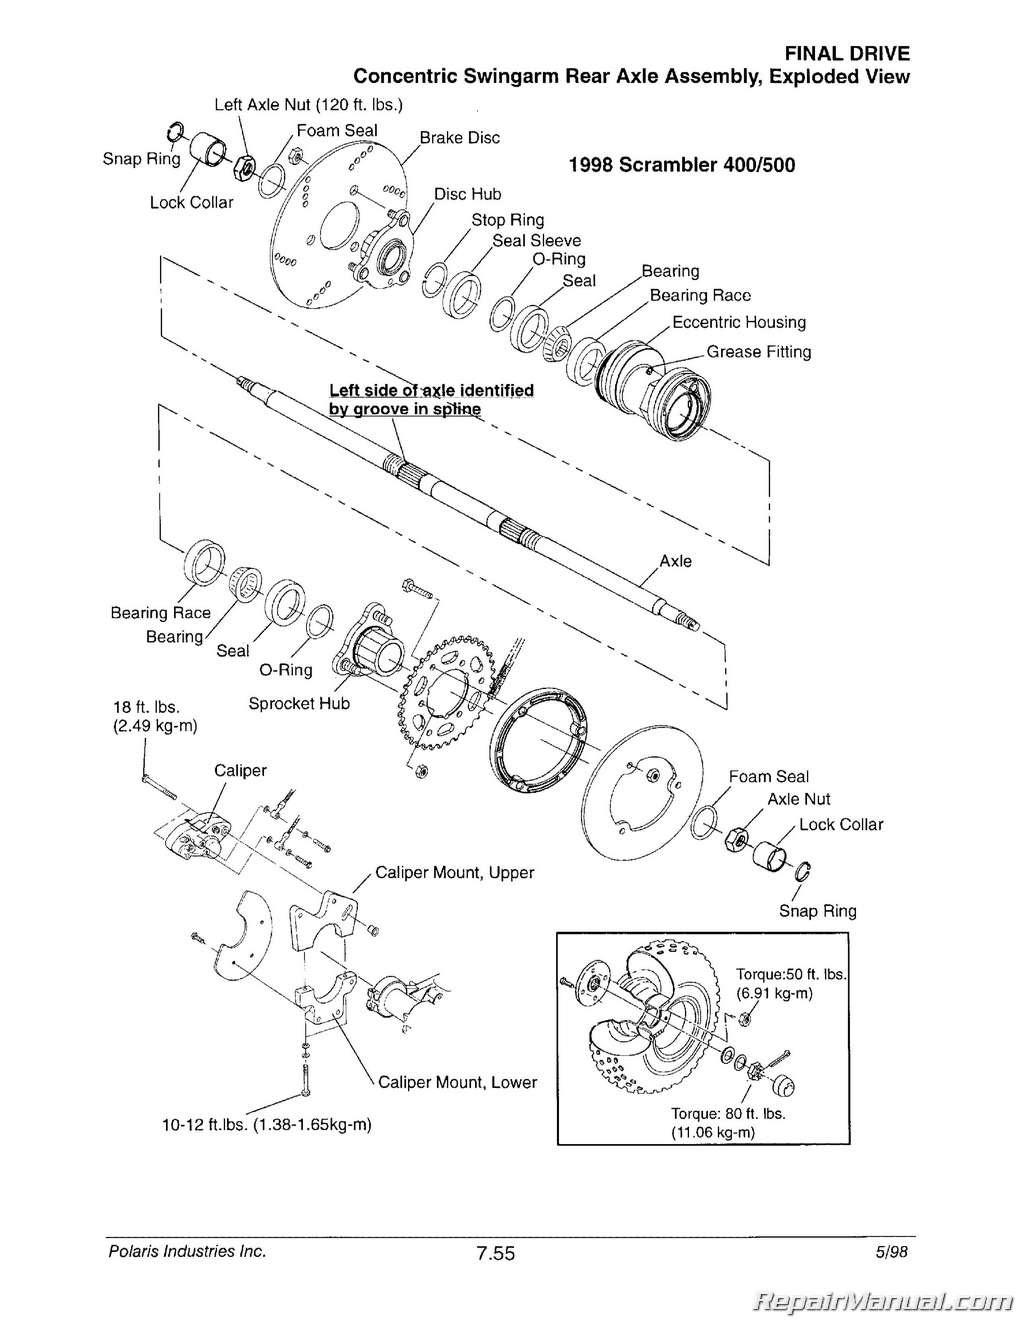 1996 1998 polaris atv and light utility vehicle